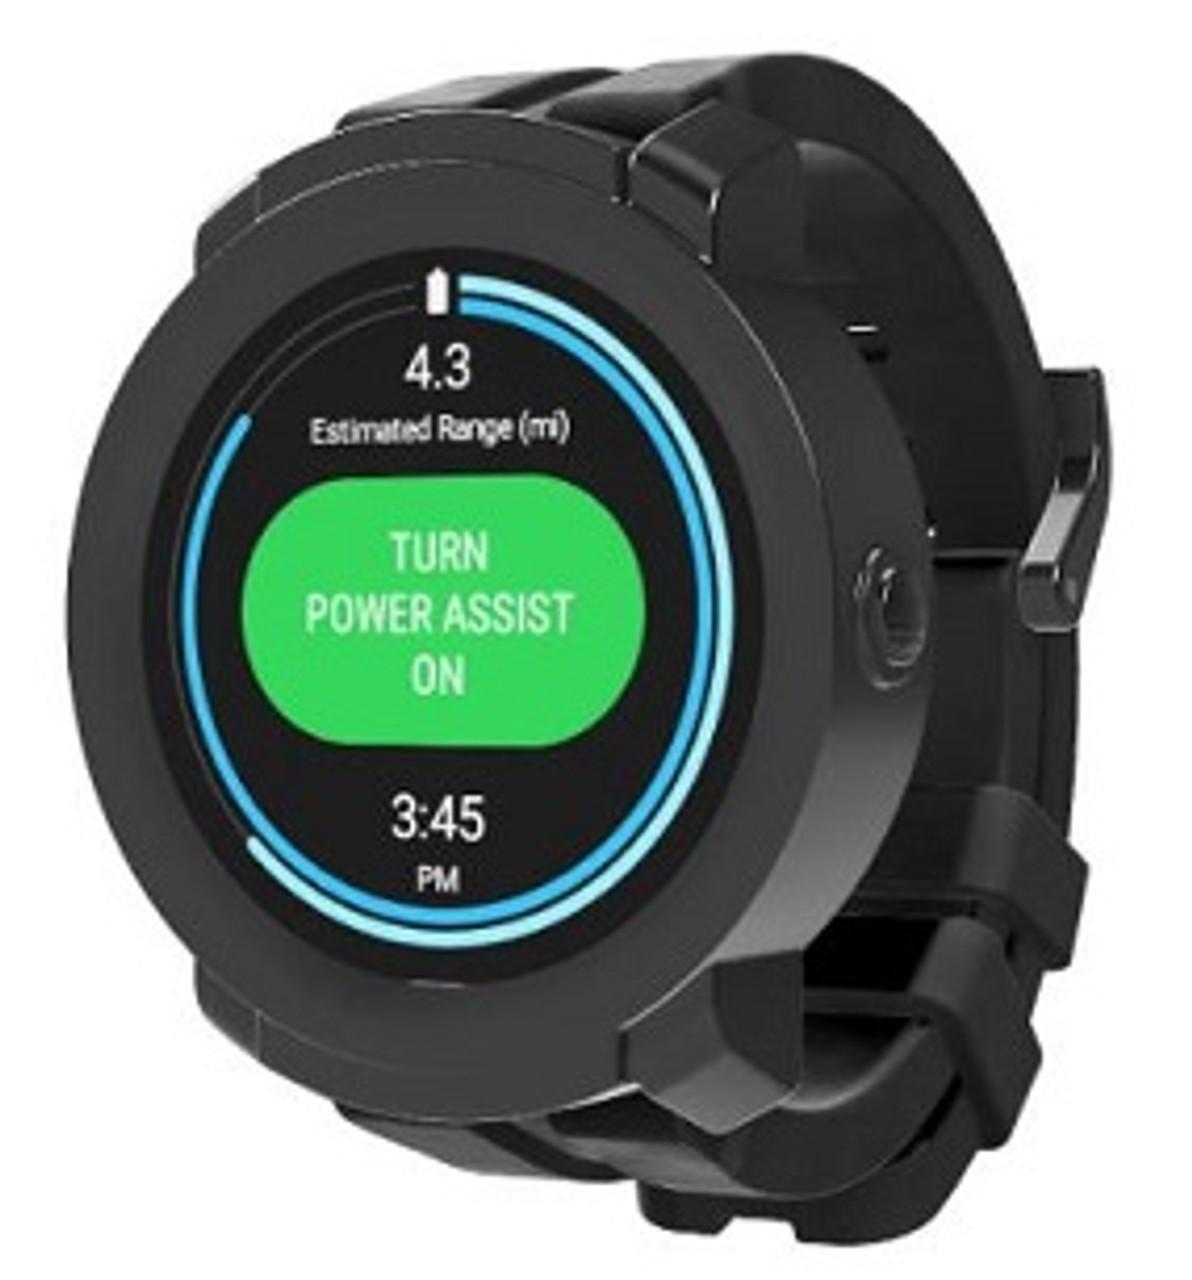 SmartDrive MX2+ with E2 Push tracker